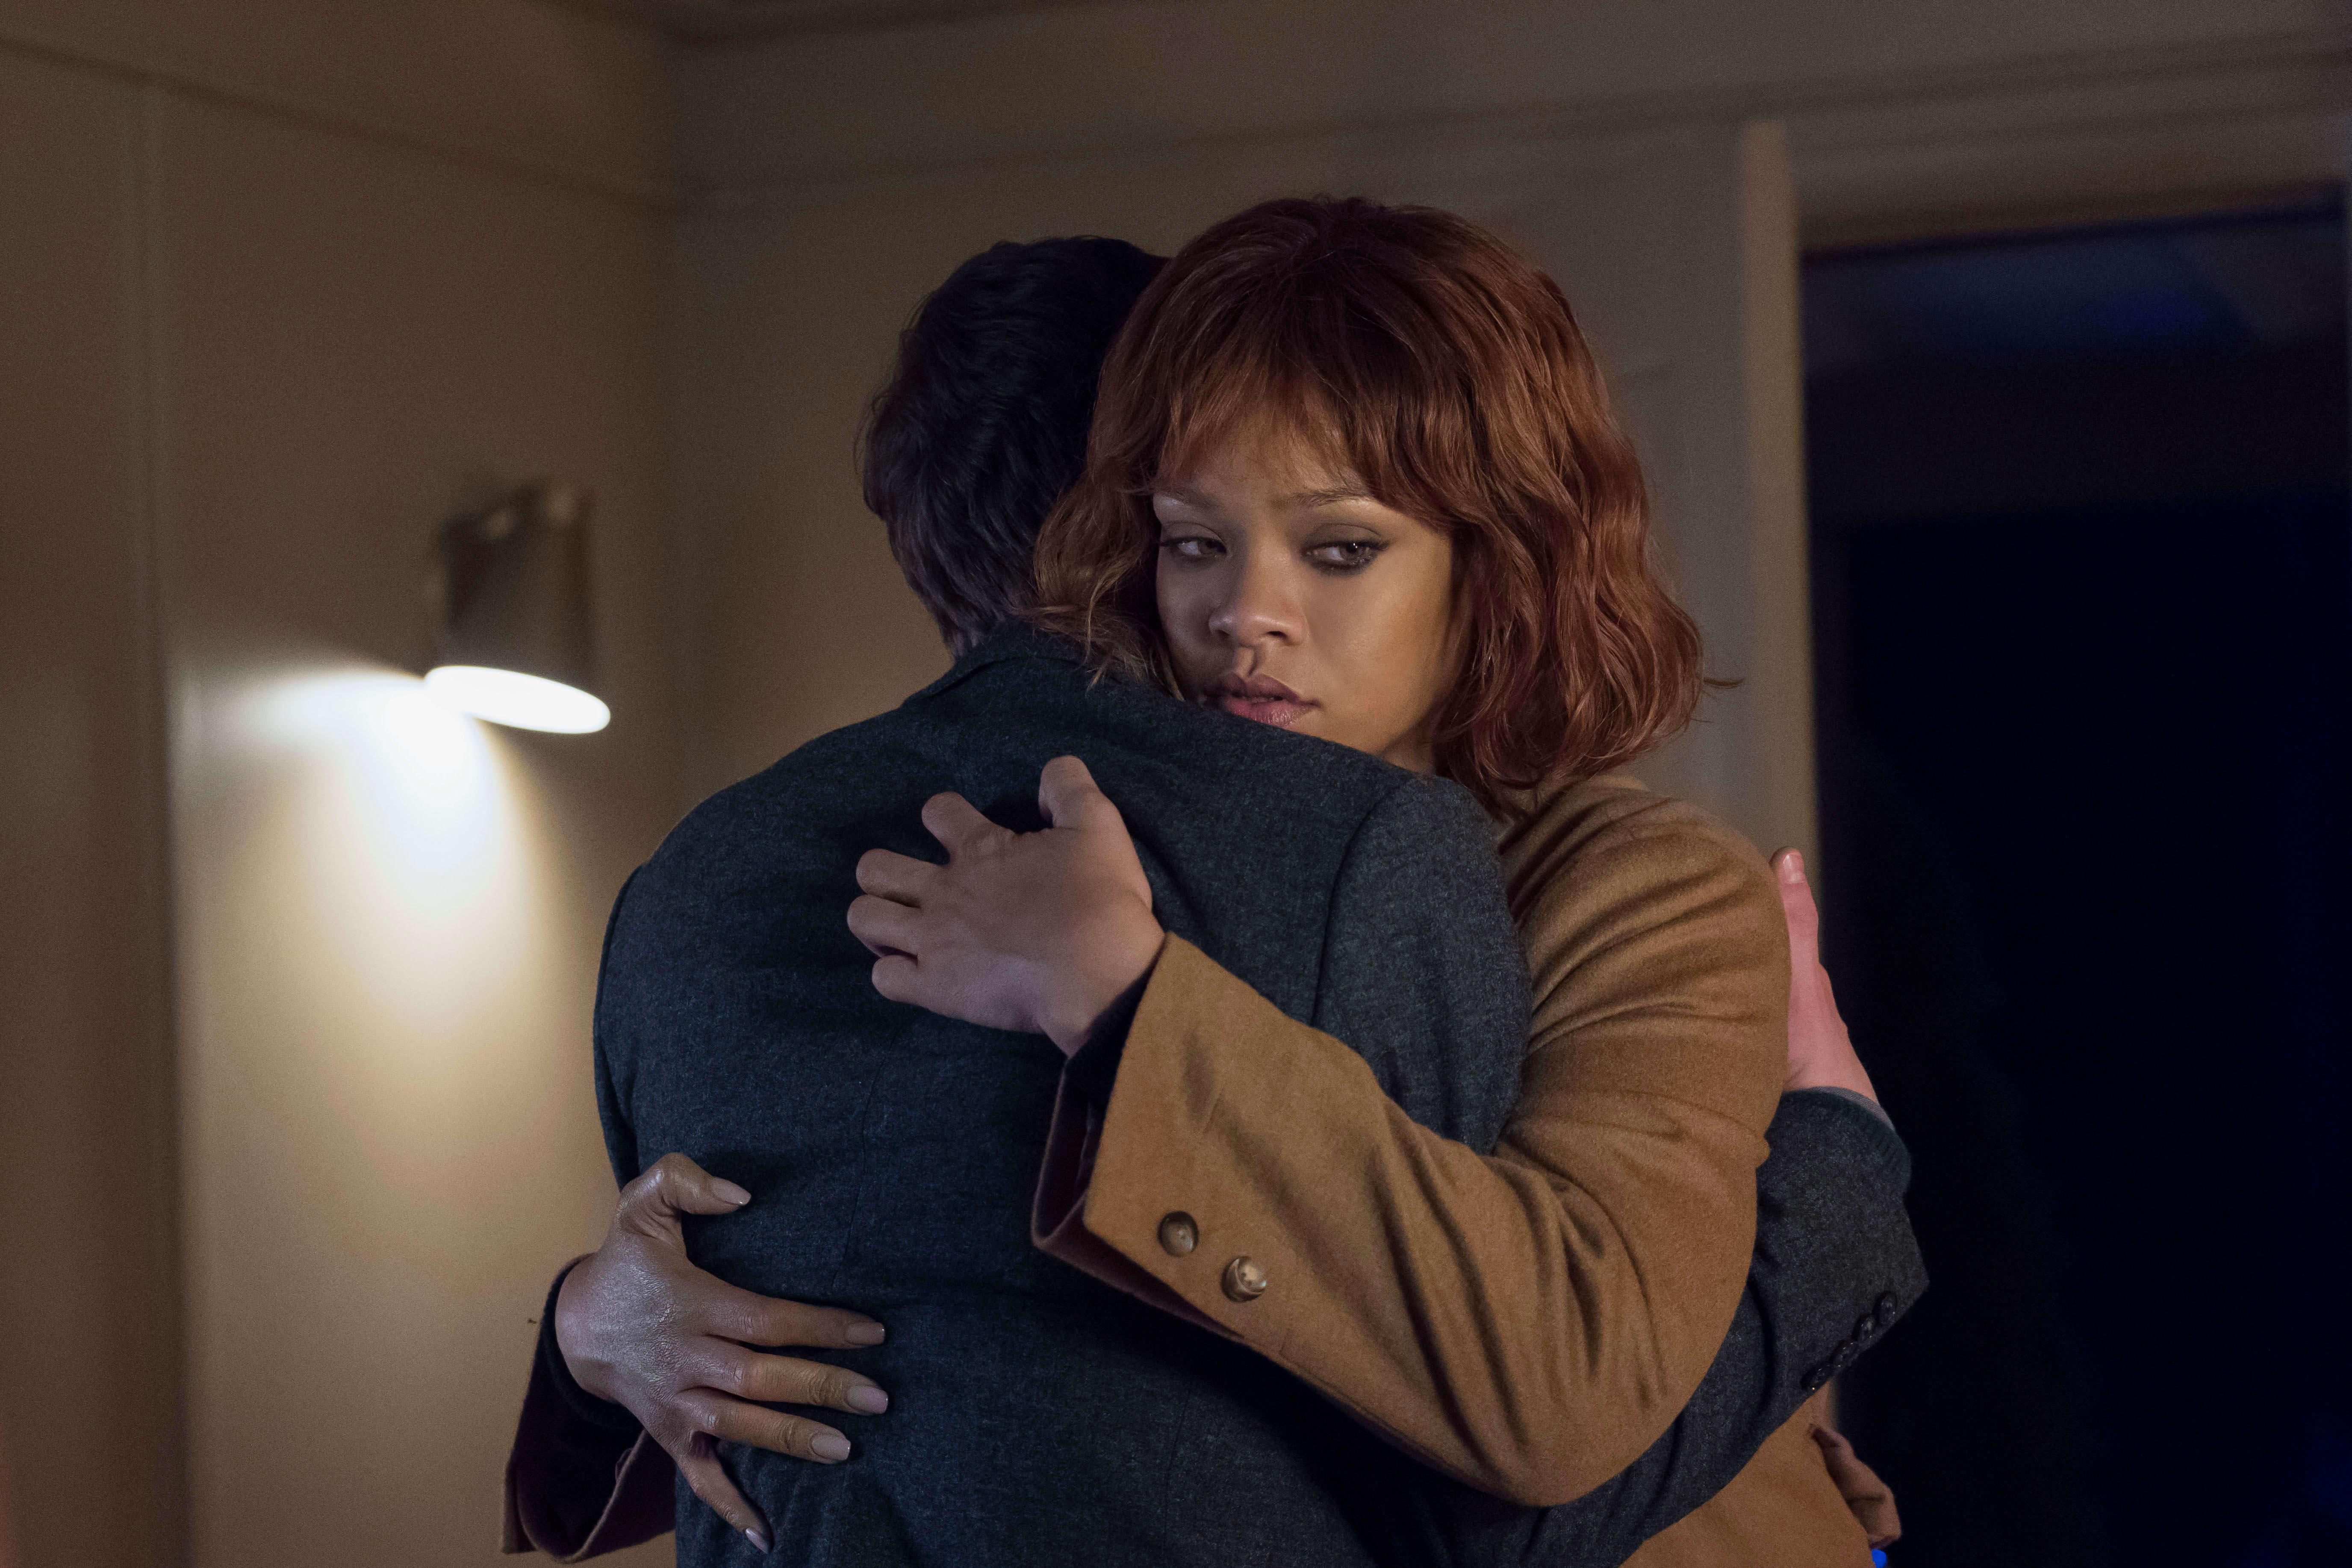 bates motel season 5 episode 1 watch free